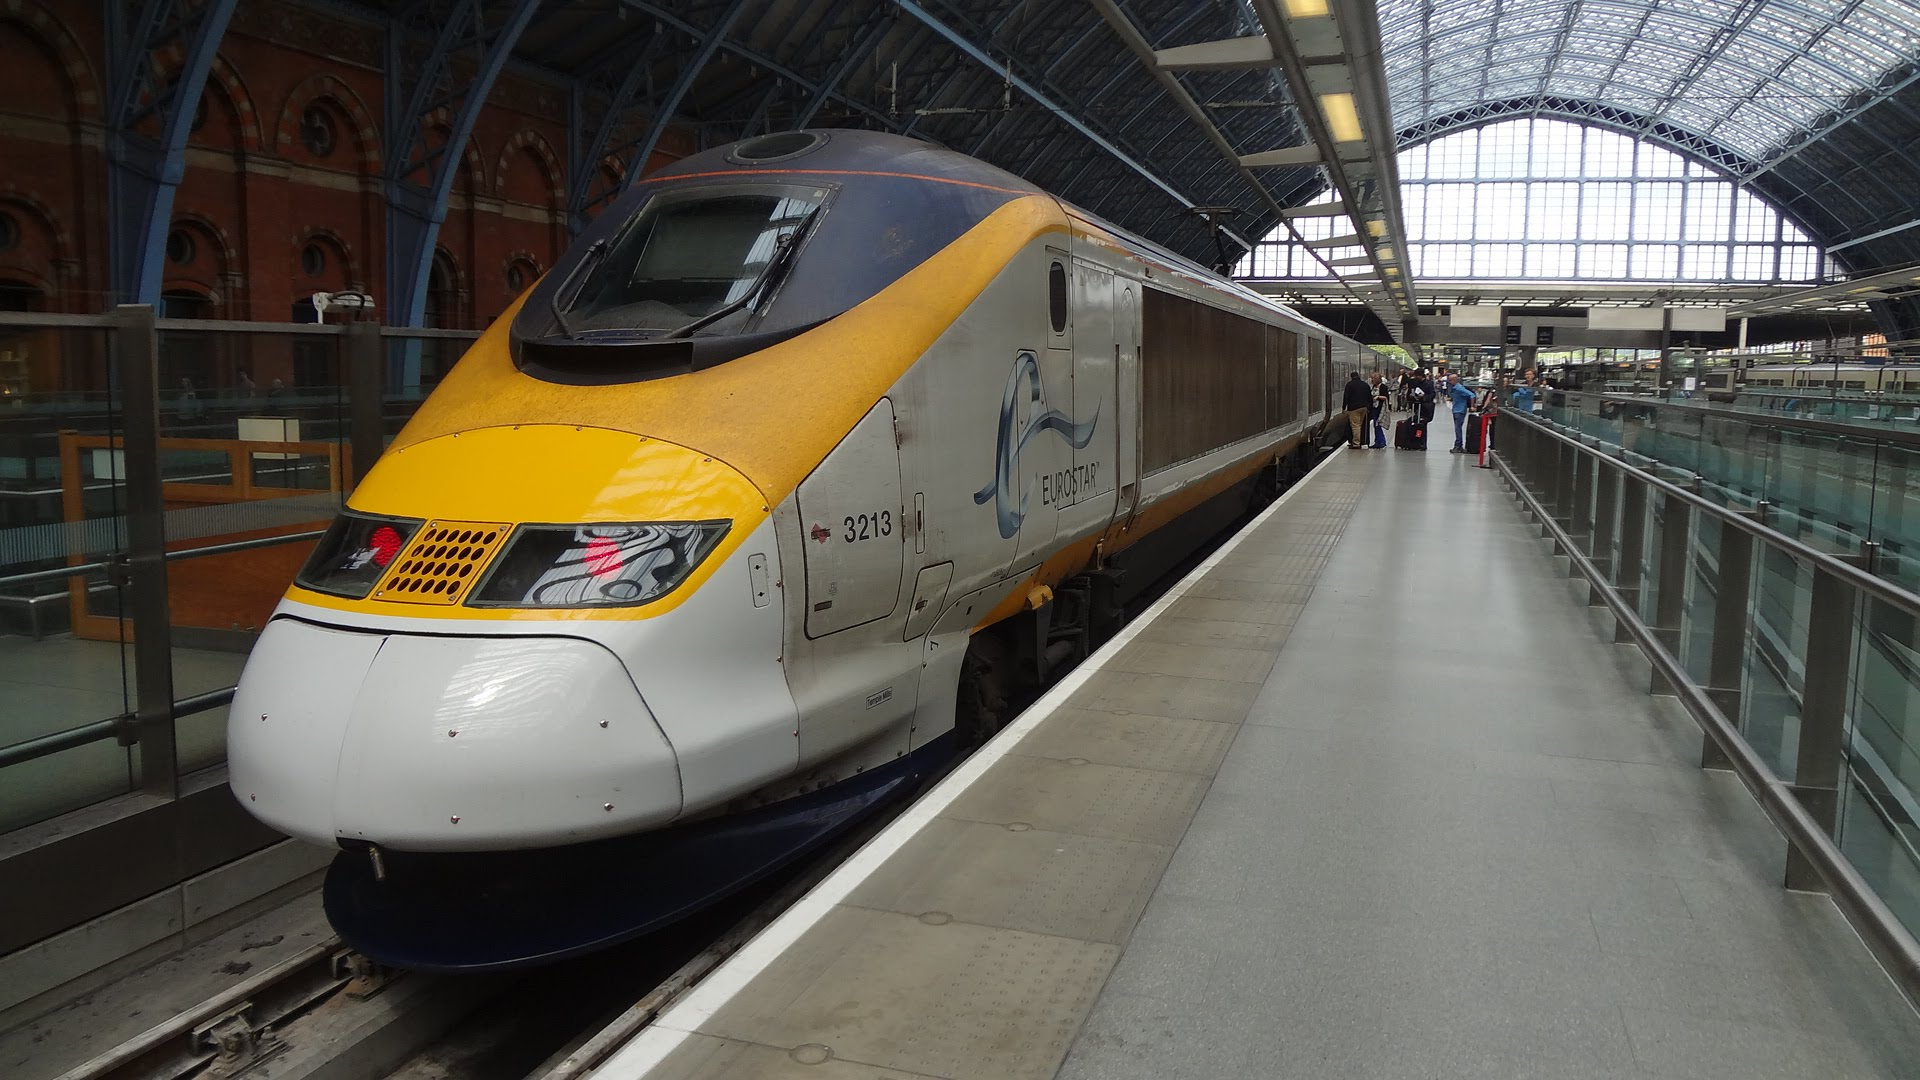 EUROSTAR / LONDON St Pancras → PARIS Gare du Nord (Passenger's View)